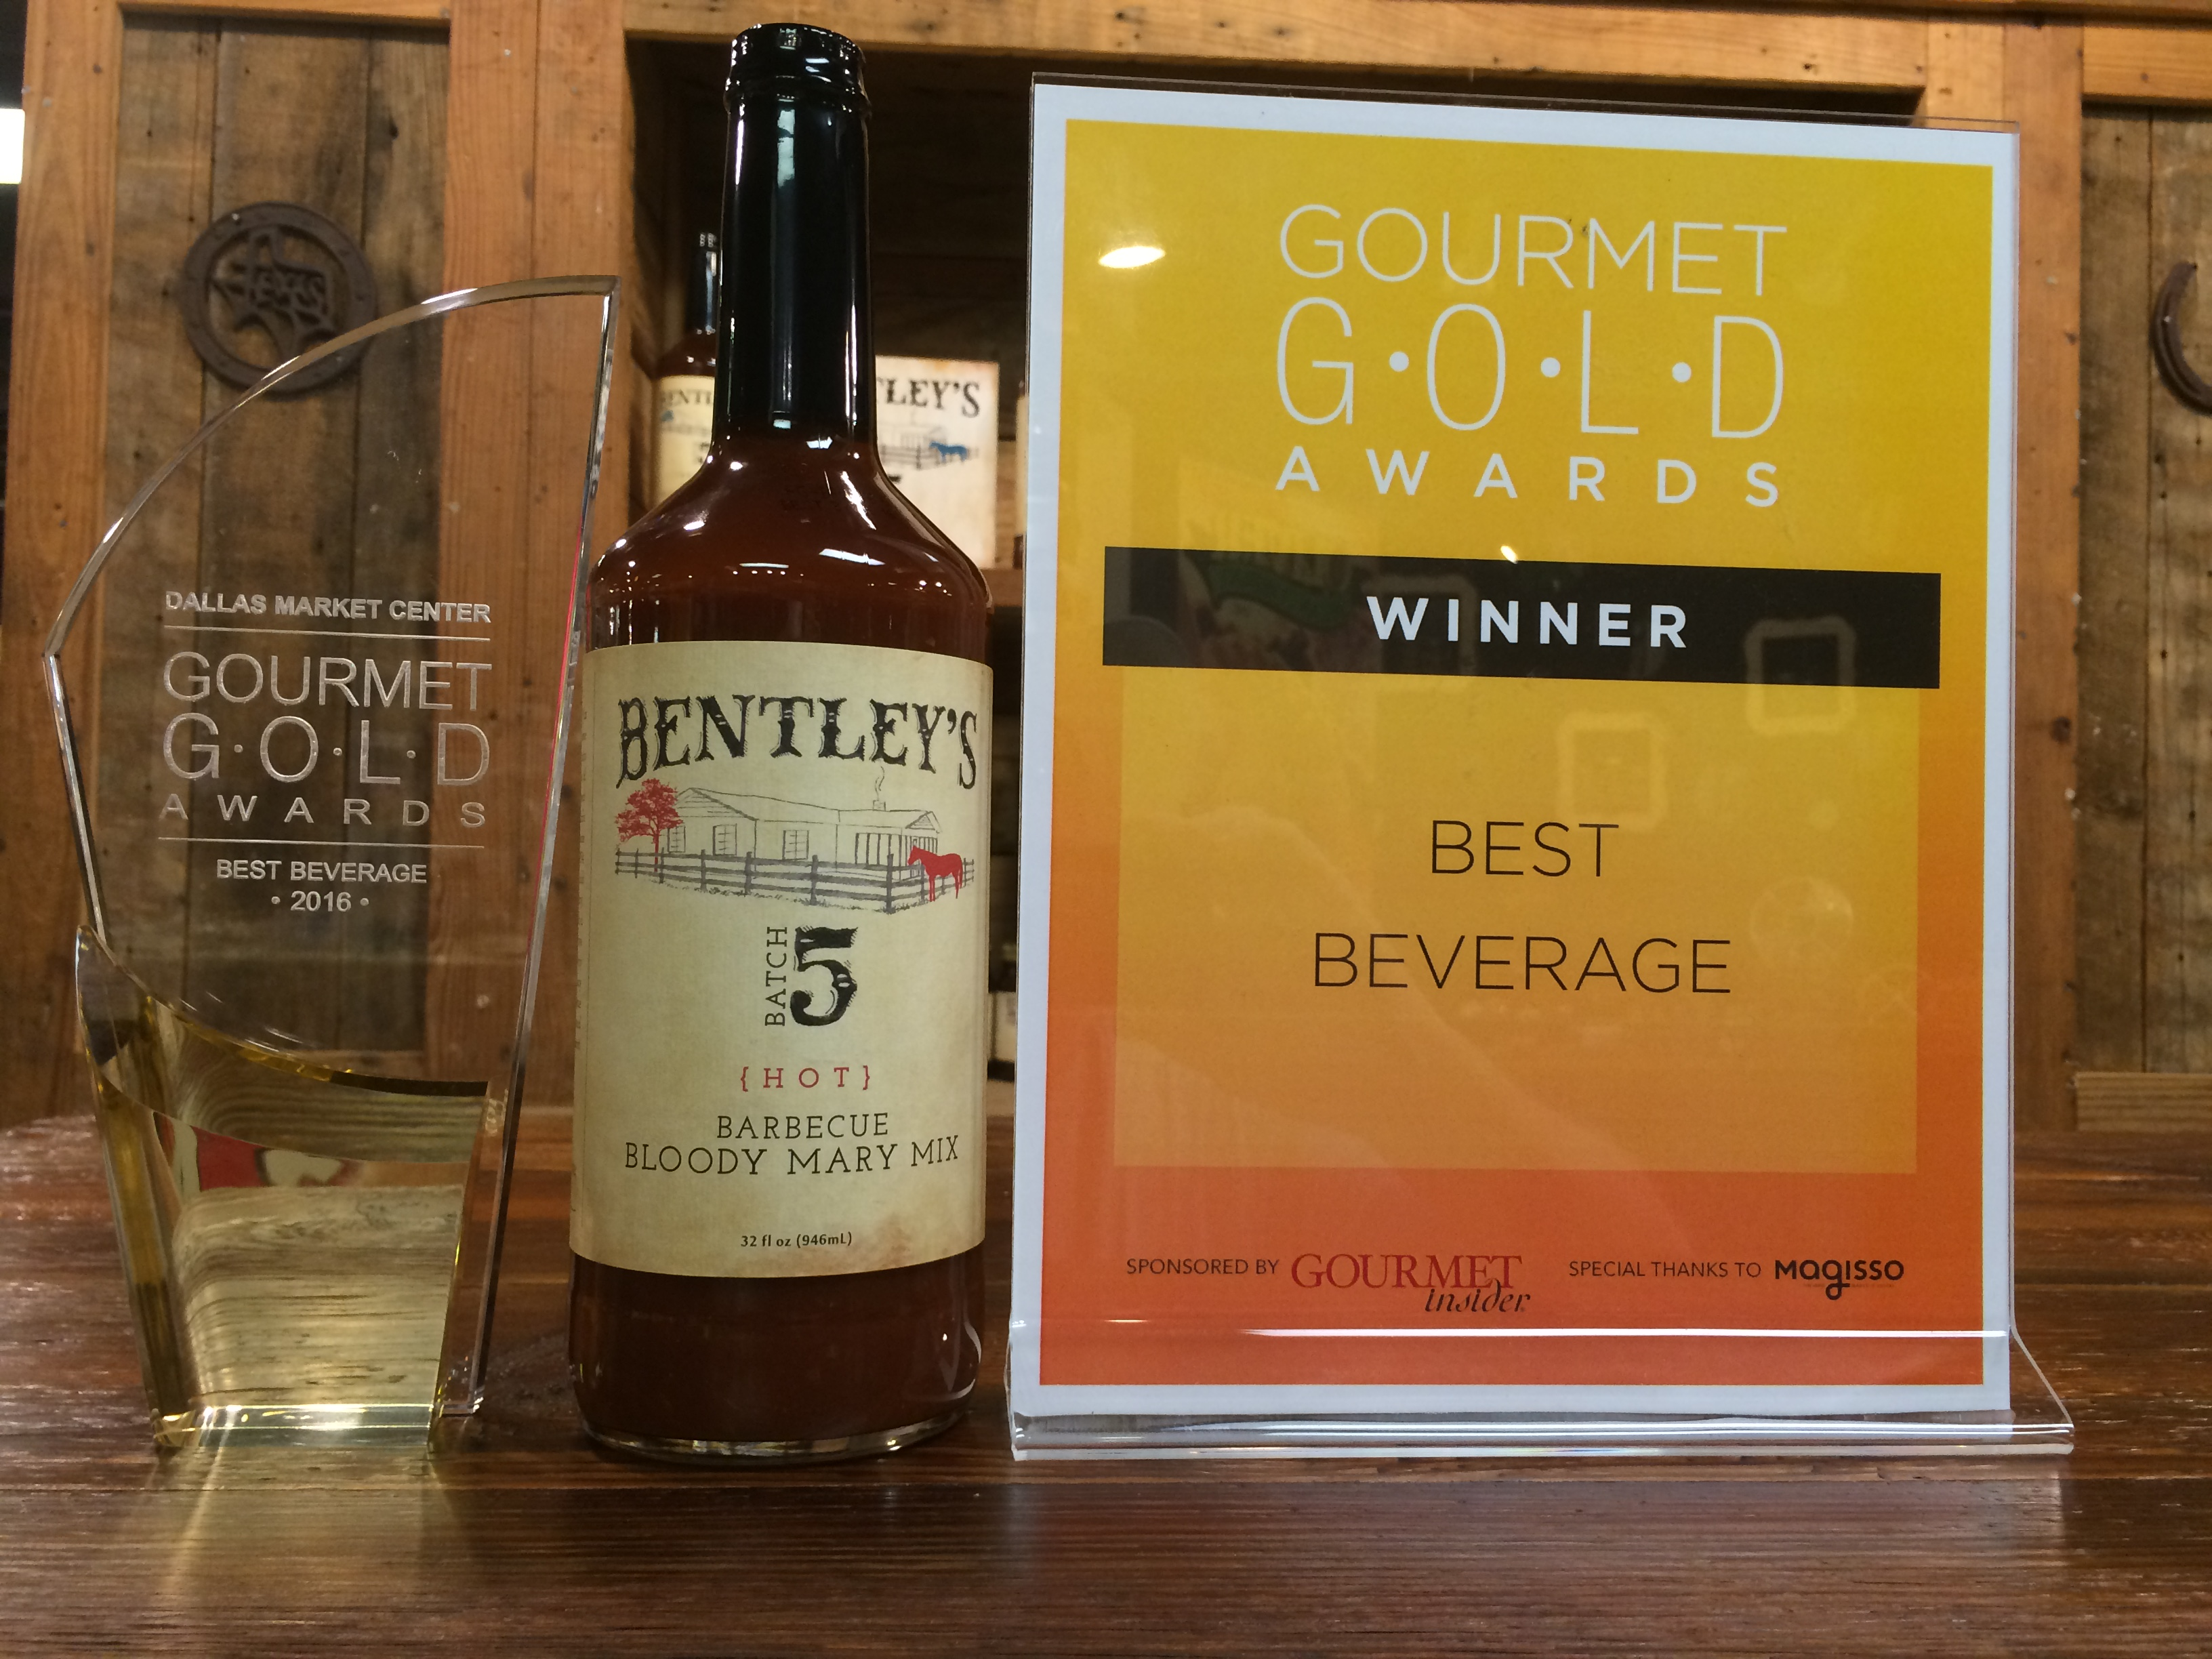 Gourmet Gold Award for Best Beverage